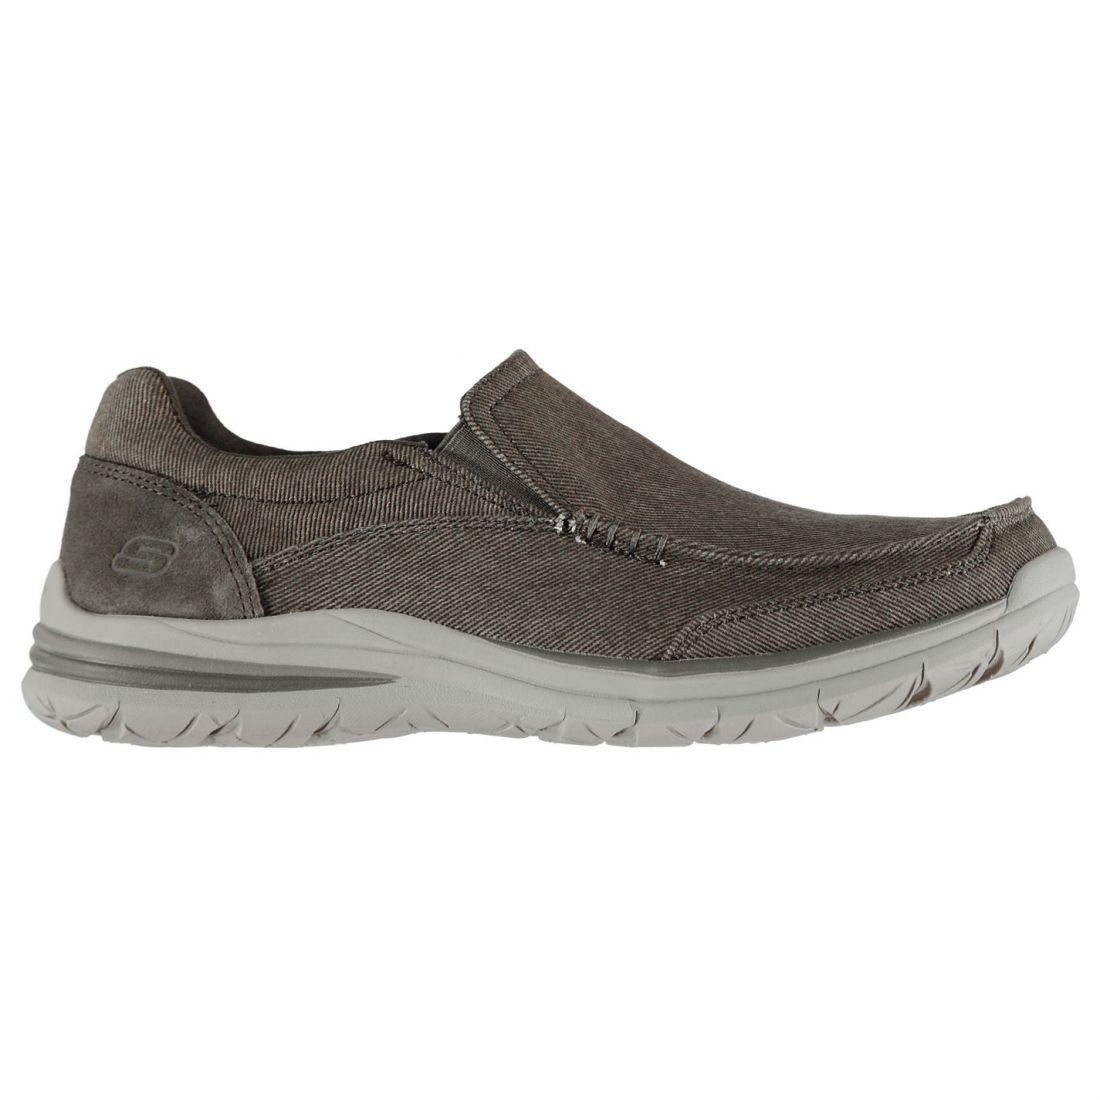 53f177dbec1c Image is loading Skechers-Mens-Superior-Vorado-Shoes-Slip-On-Trainers-